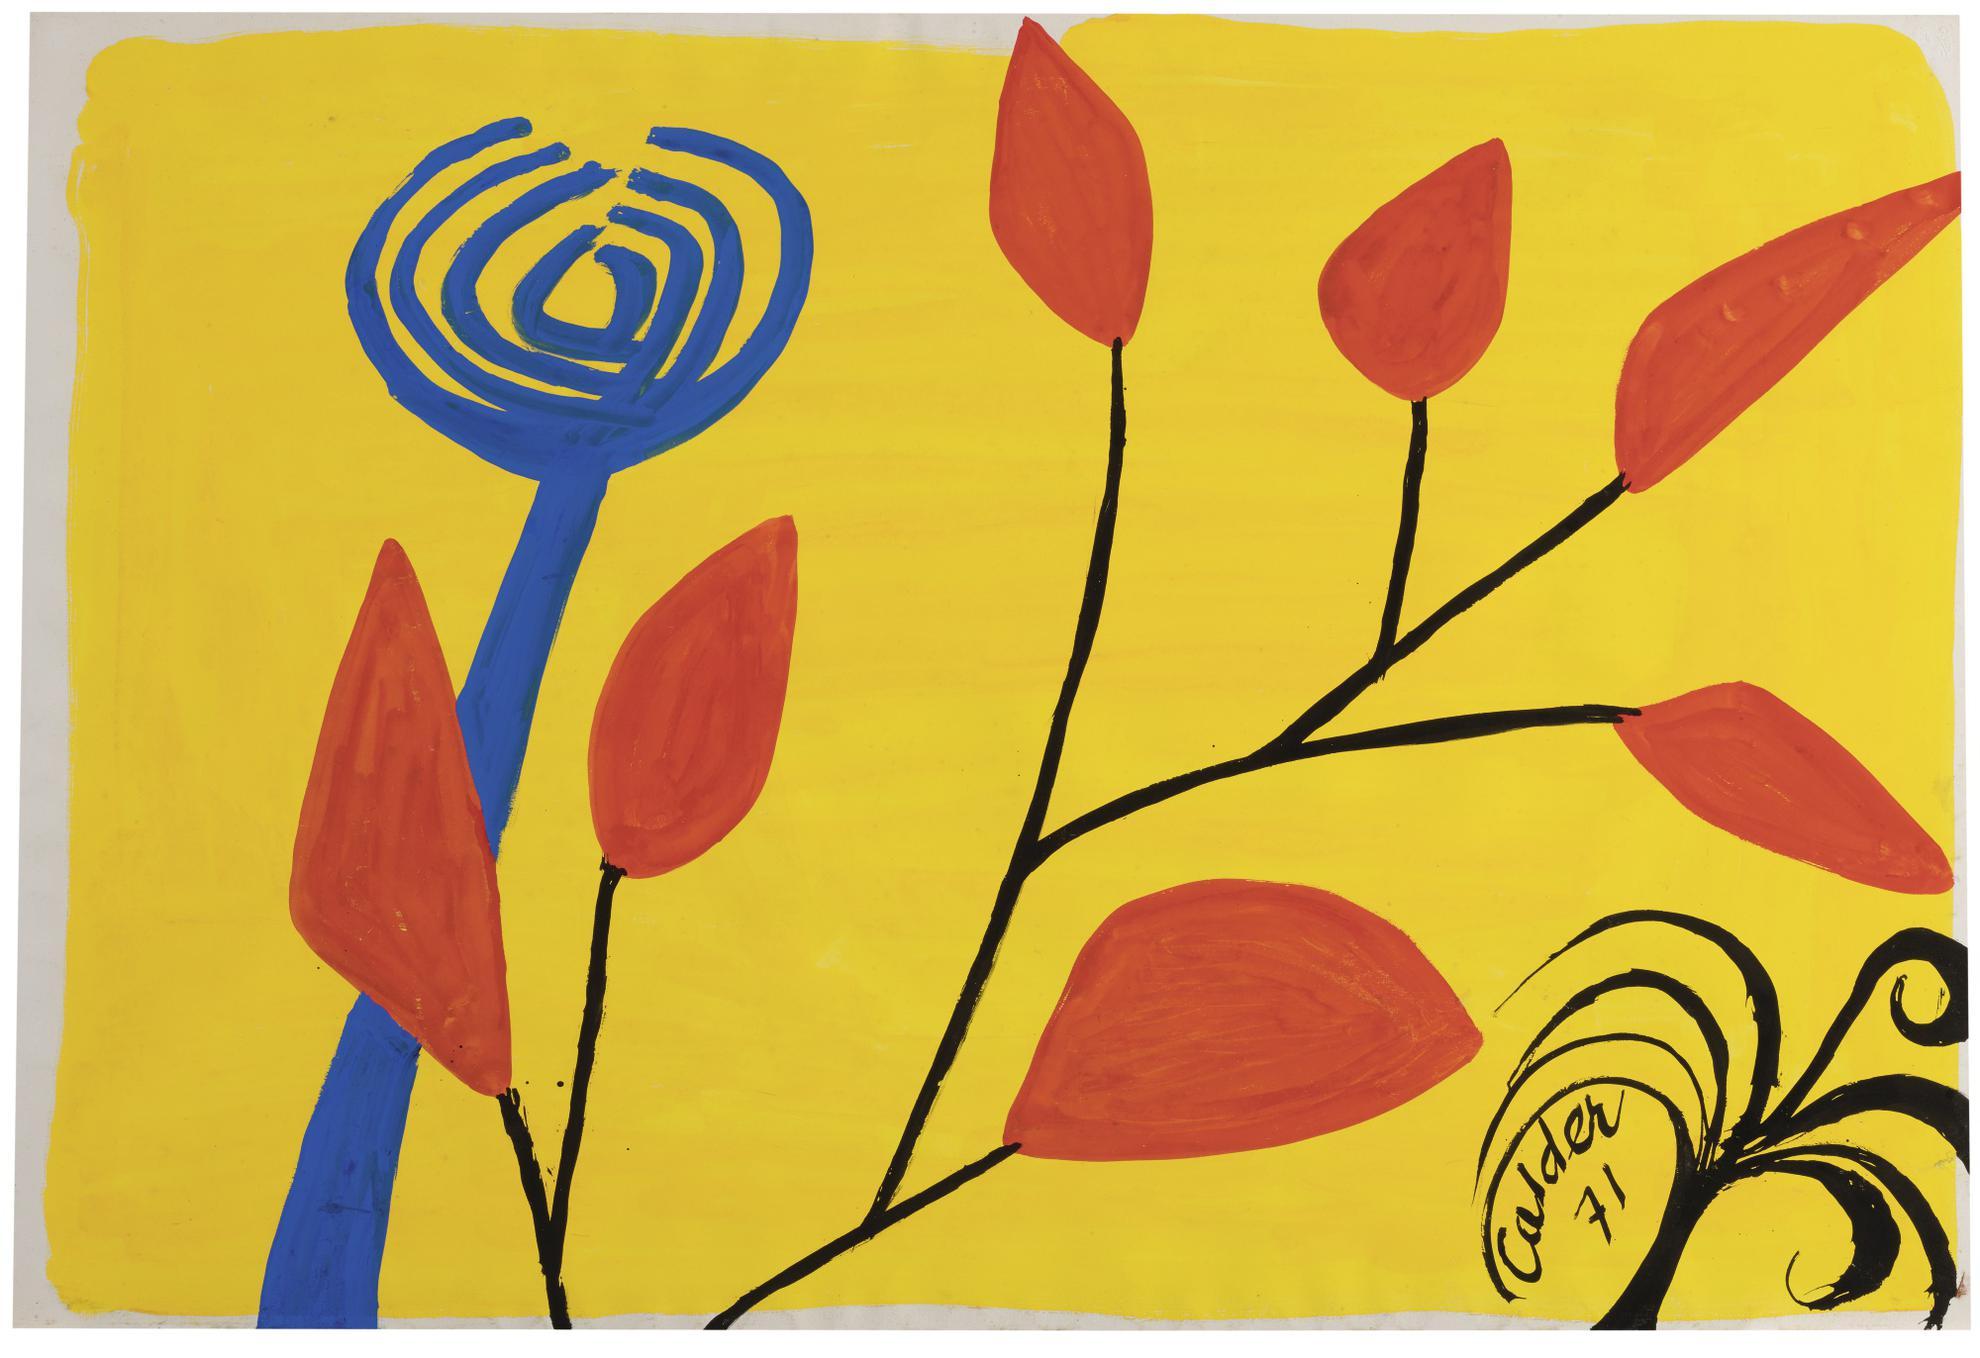 Alexander Calder-Flower On A Yellow Ground-1971